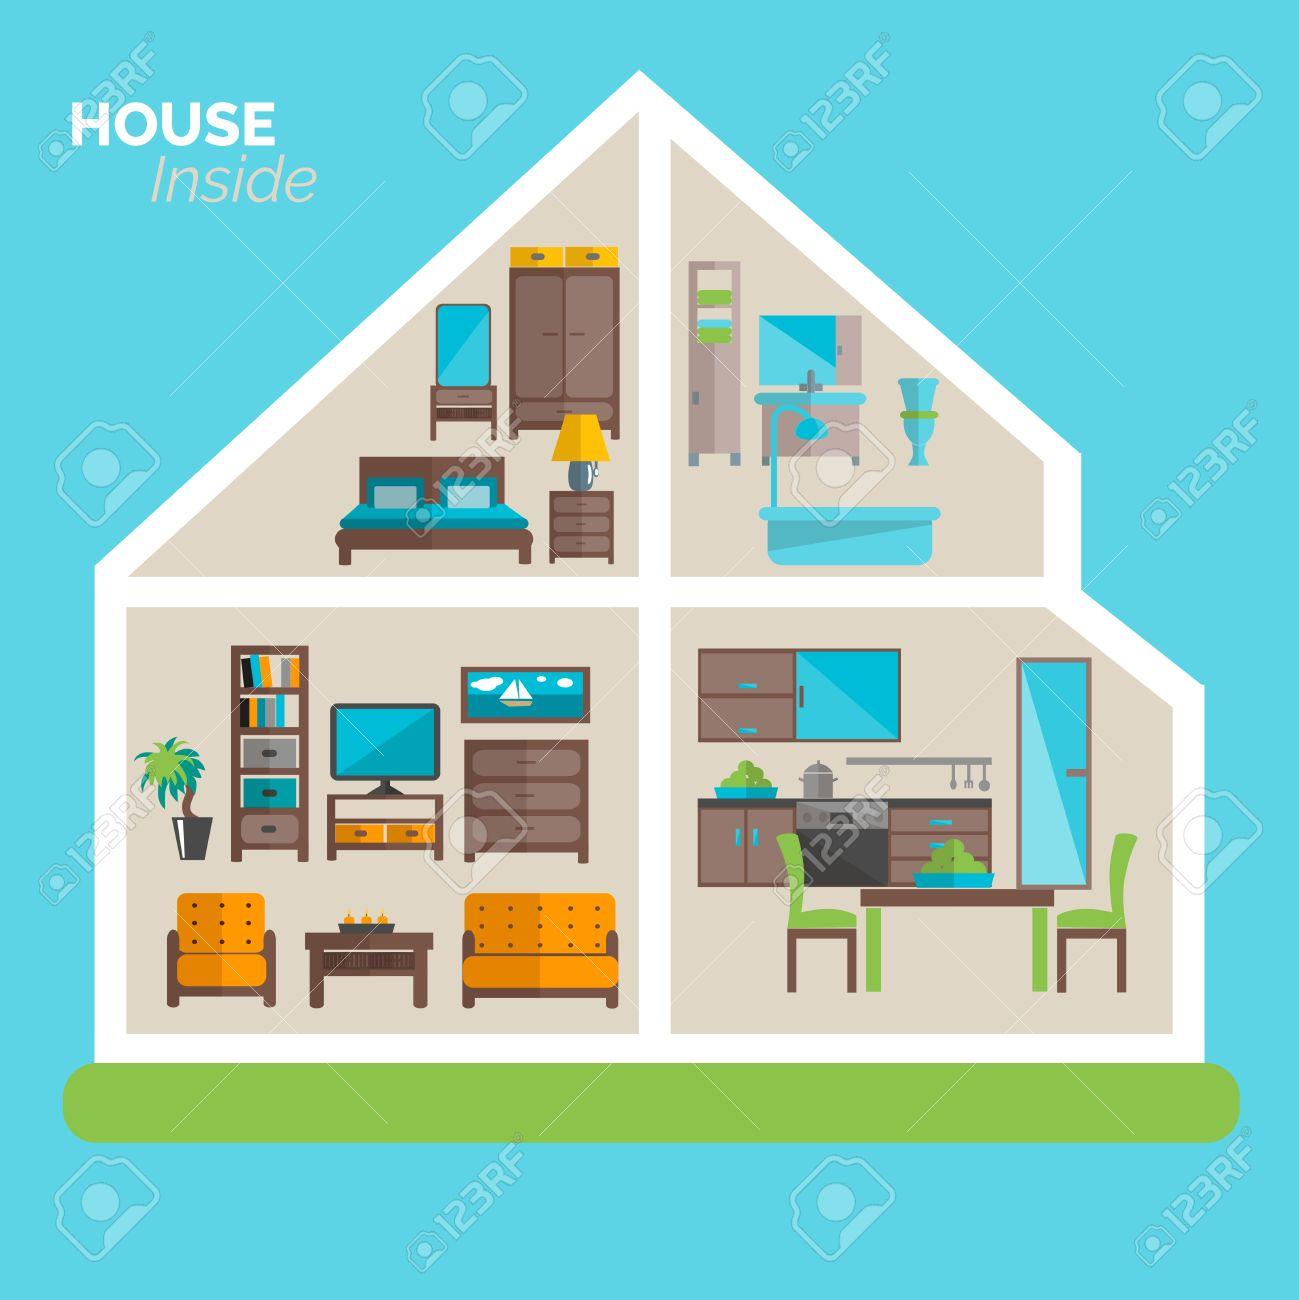 House inside interior design ideas poster for sleeping sitting..